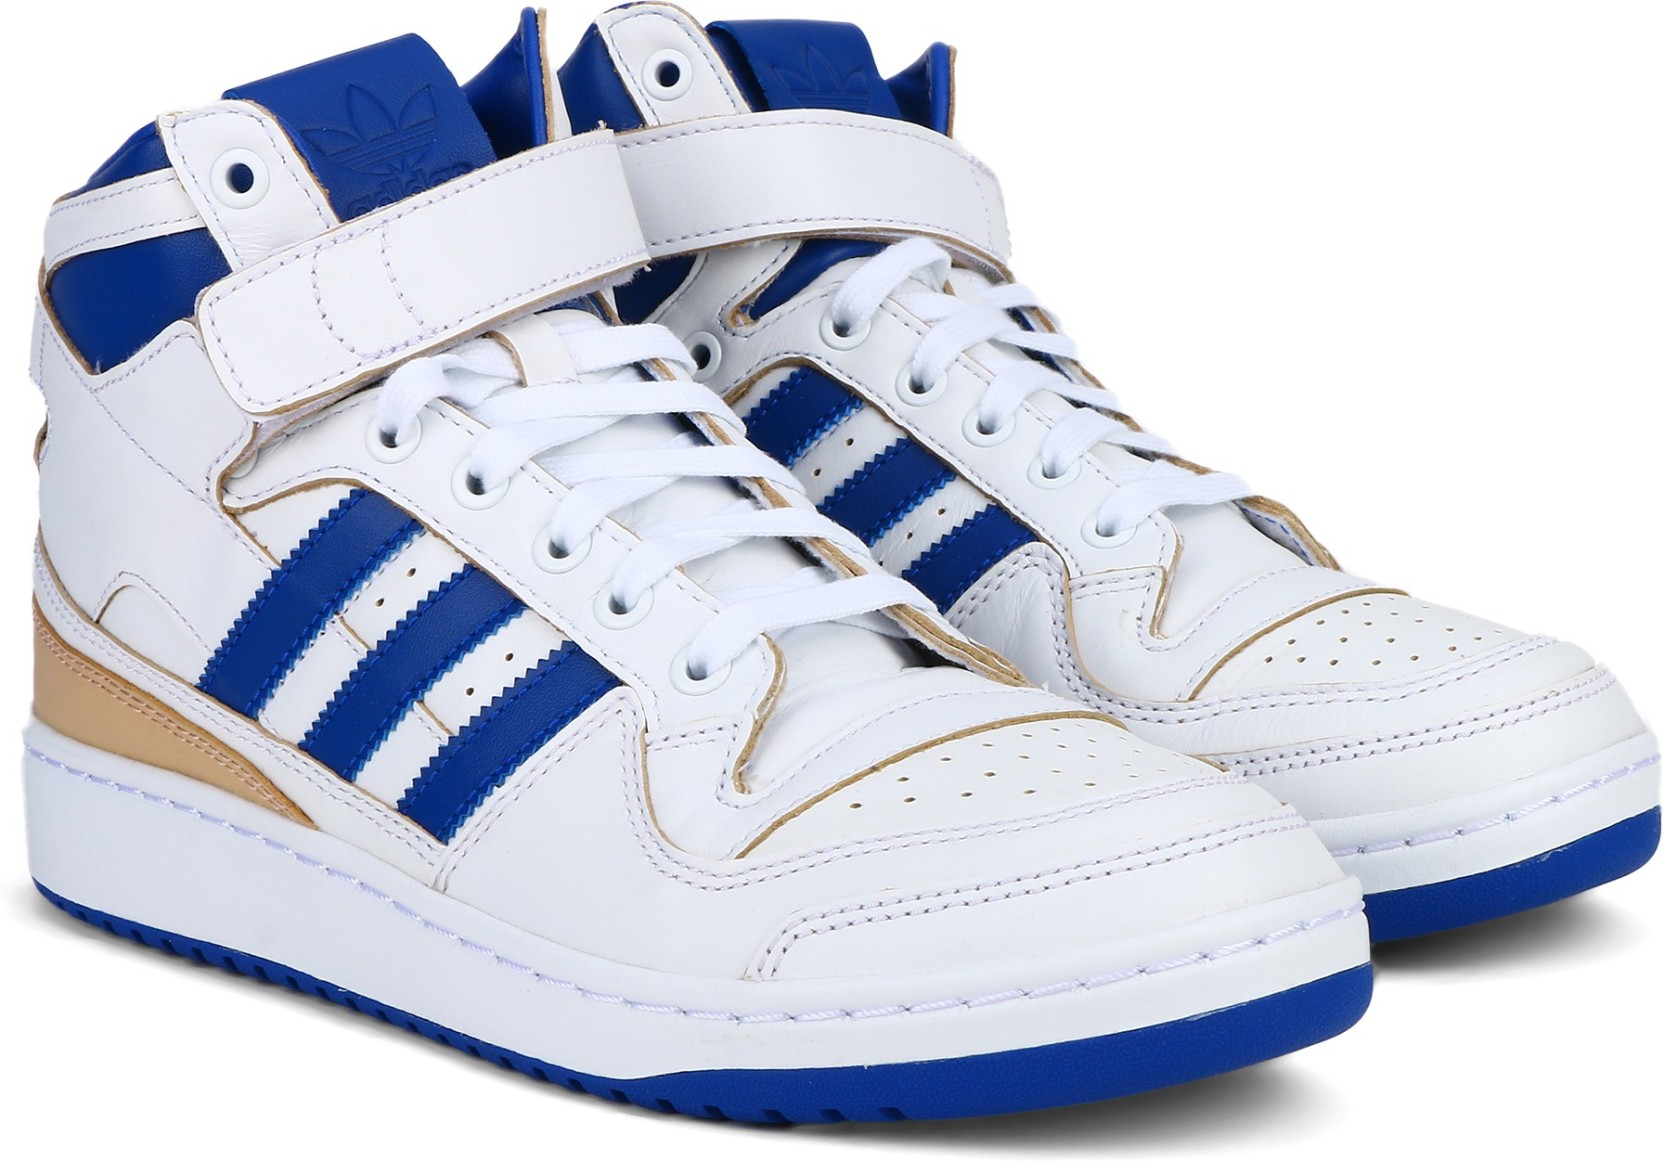 86518bb9673 ADIDAS ORIGINALS FORUM MID (WRAP) Sneakers For Men - Buy FTWWHT ...